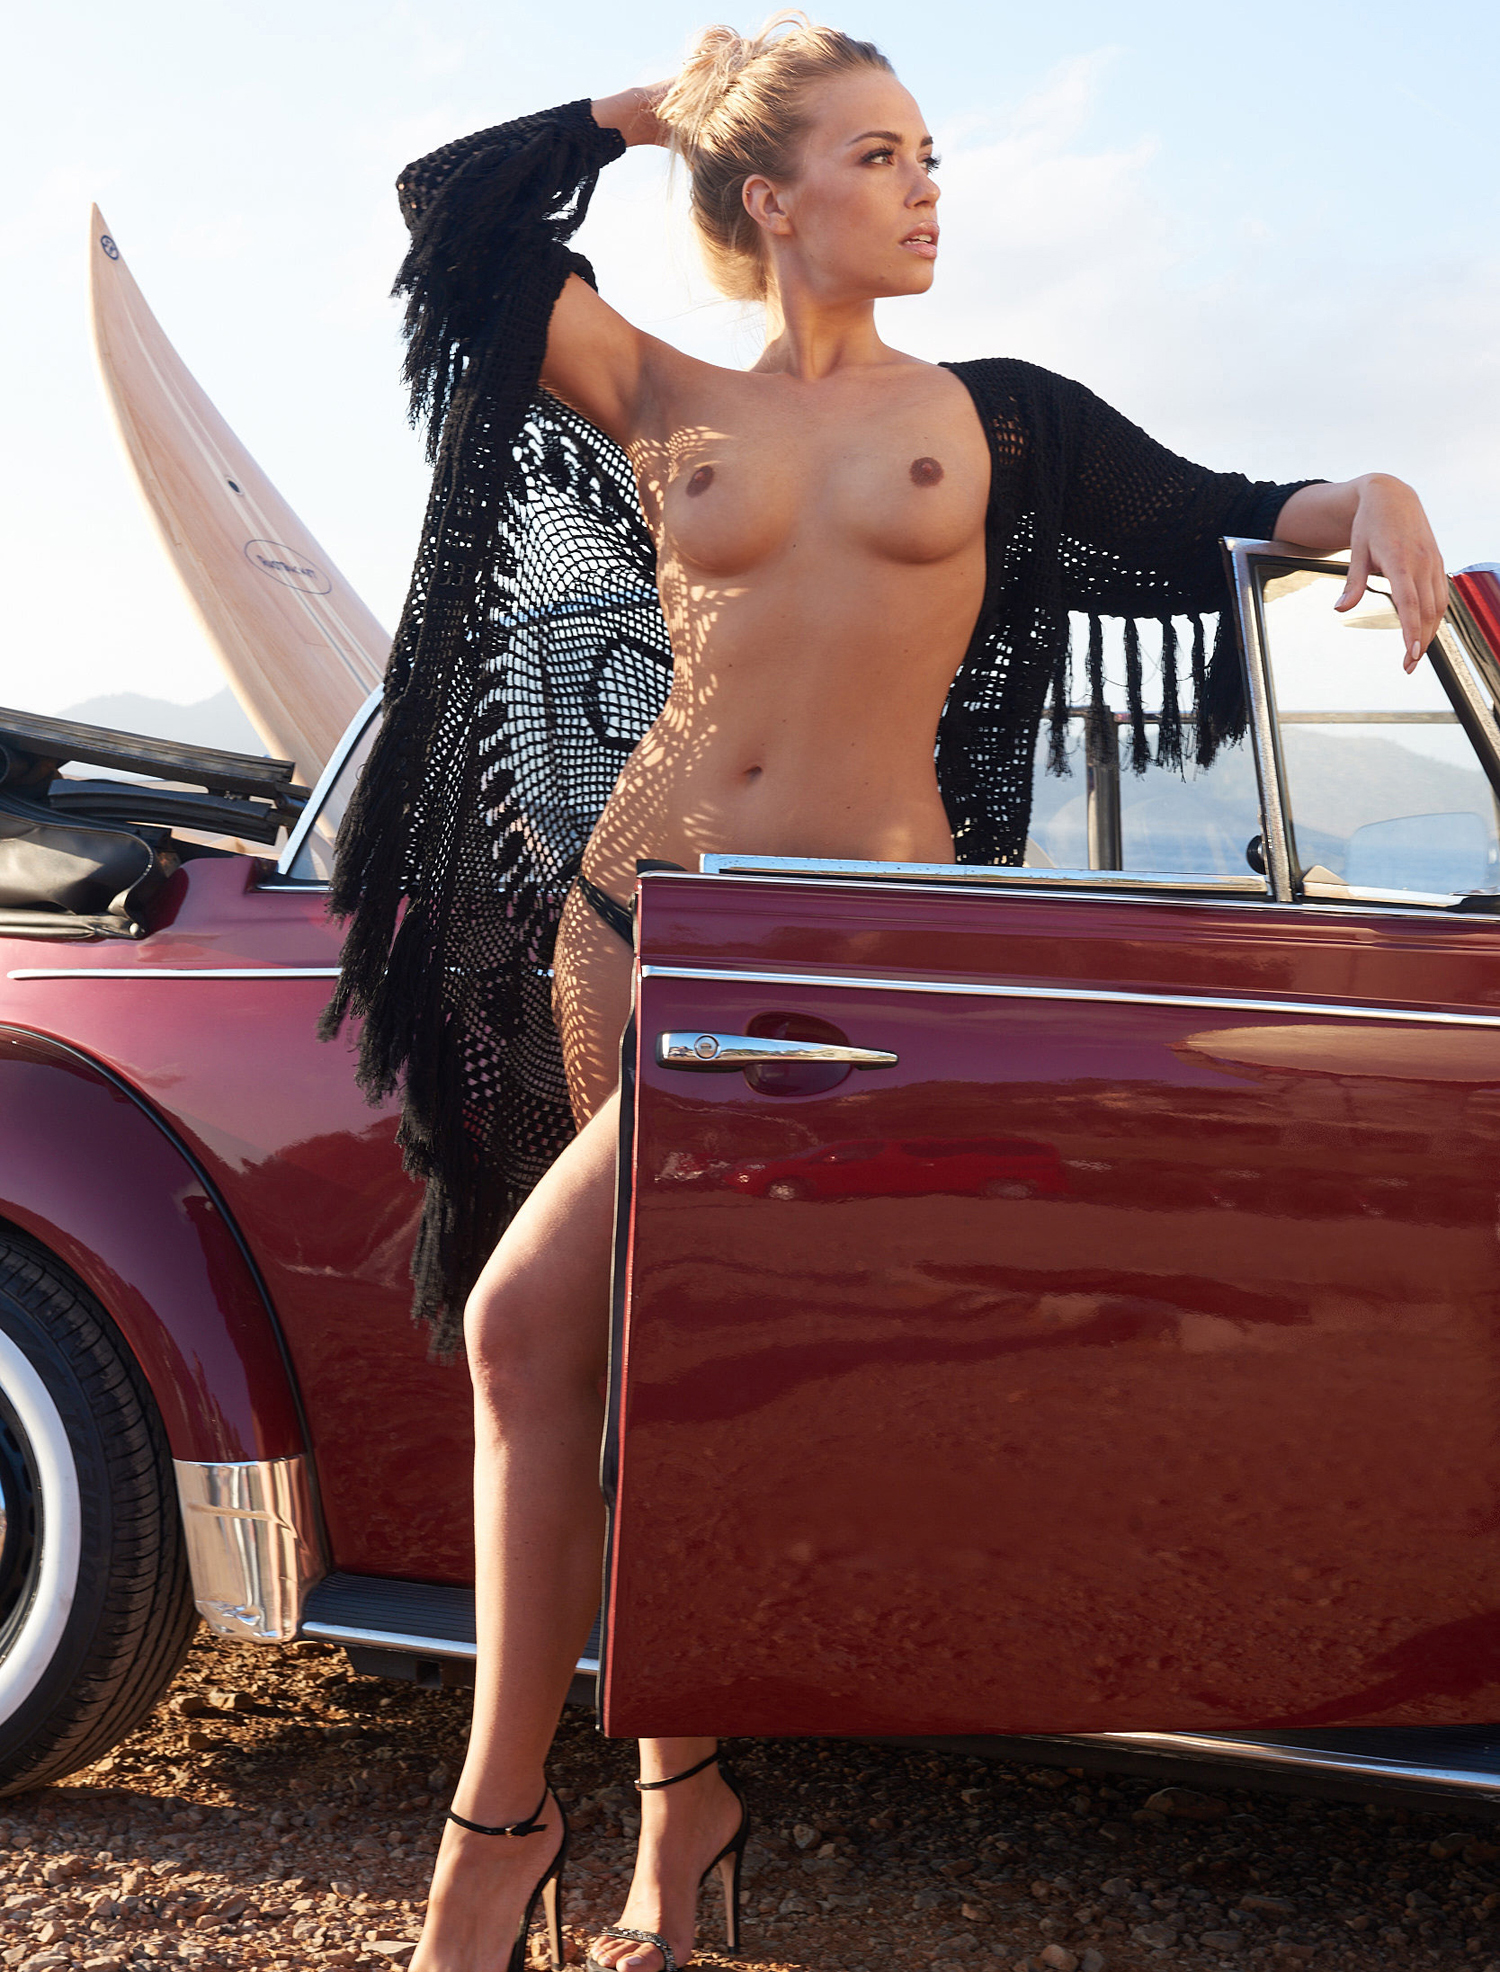 Лара-Изабель Рентинк голая. Фото - 40